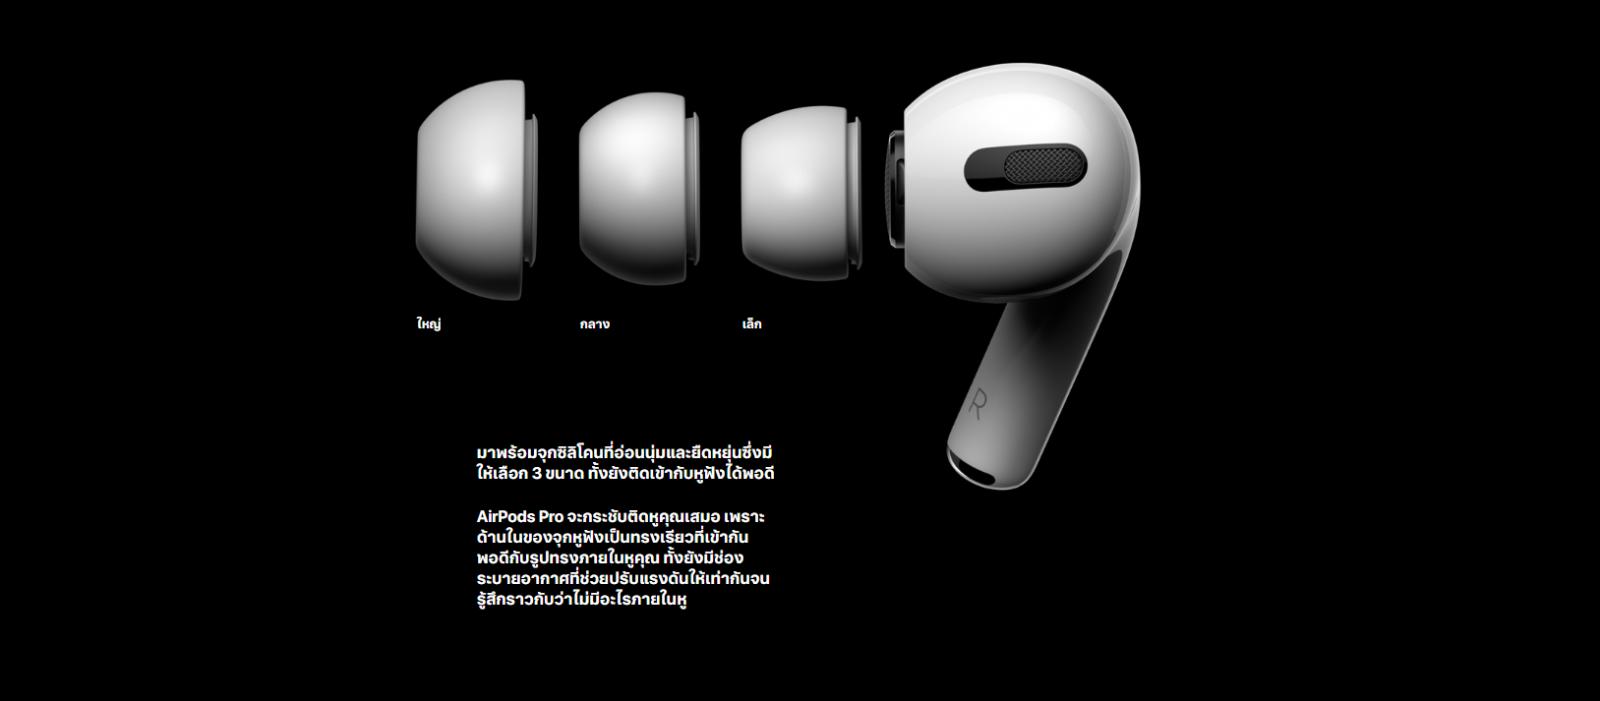 Apple เปิดตัว AirPods Pro ใหม่ในรูปแบบ In-Ear